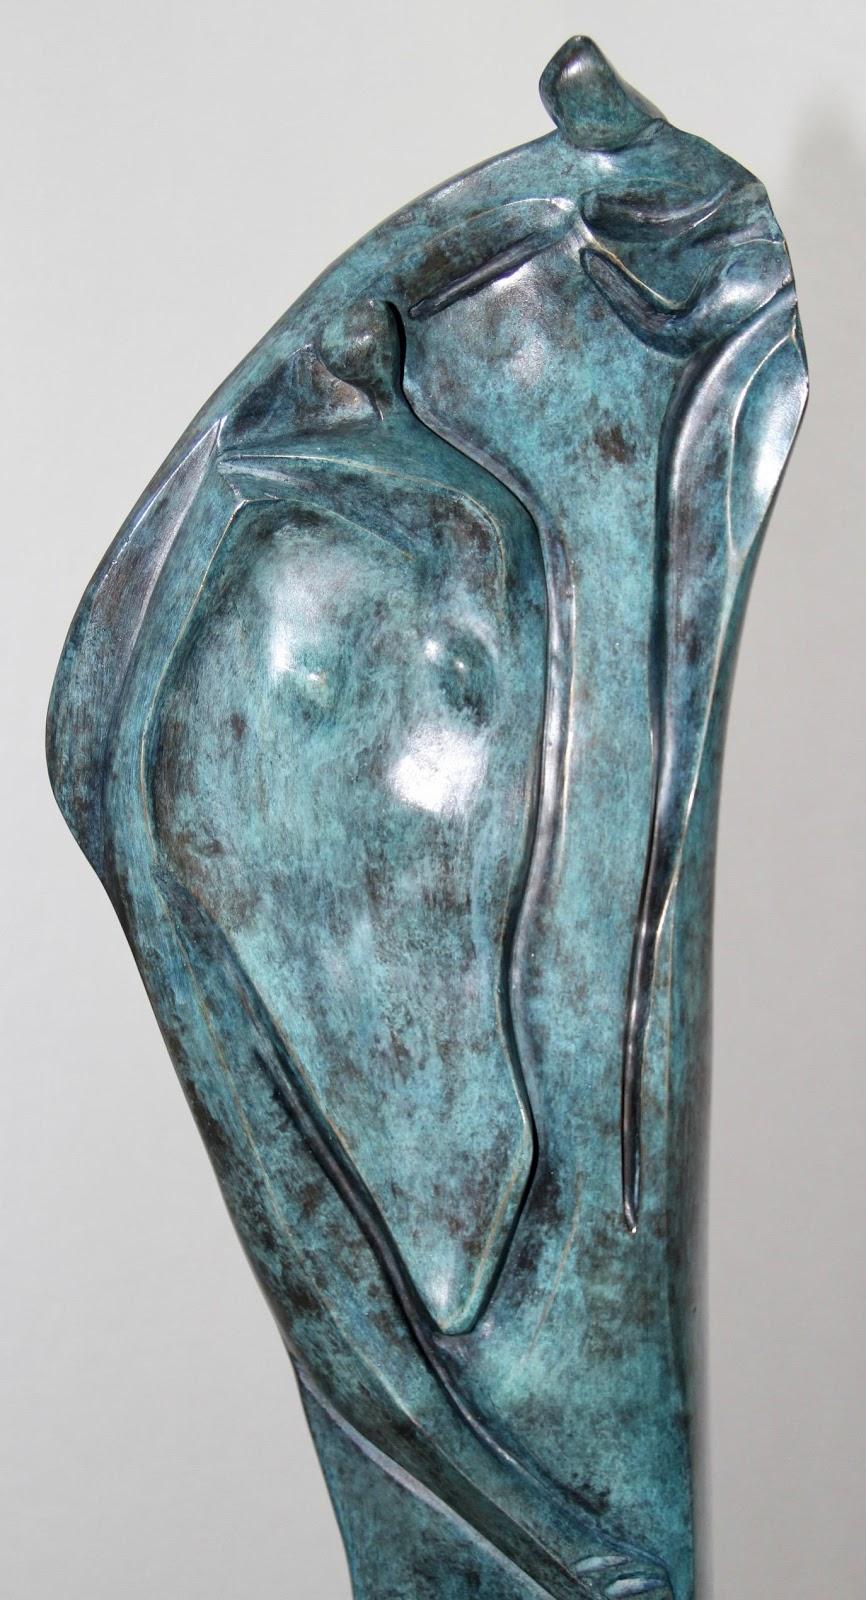 Historias - Escultura, Nour Kuri